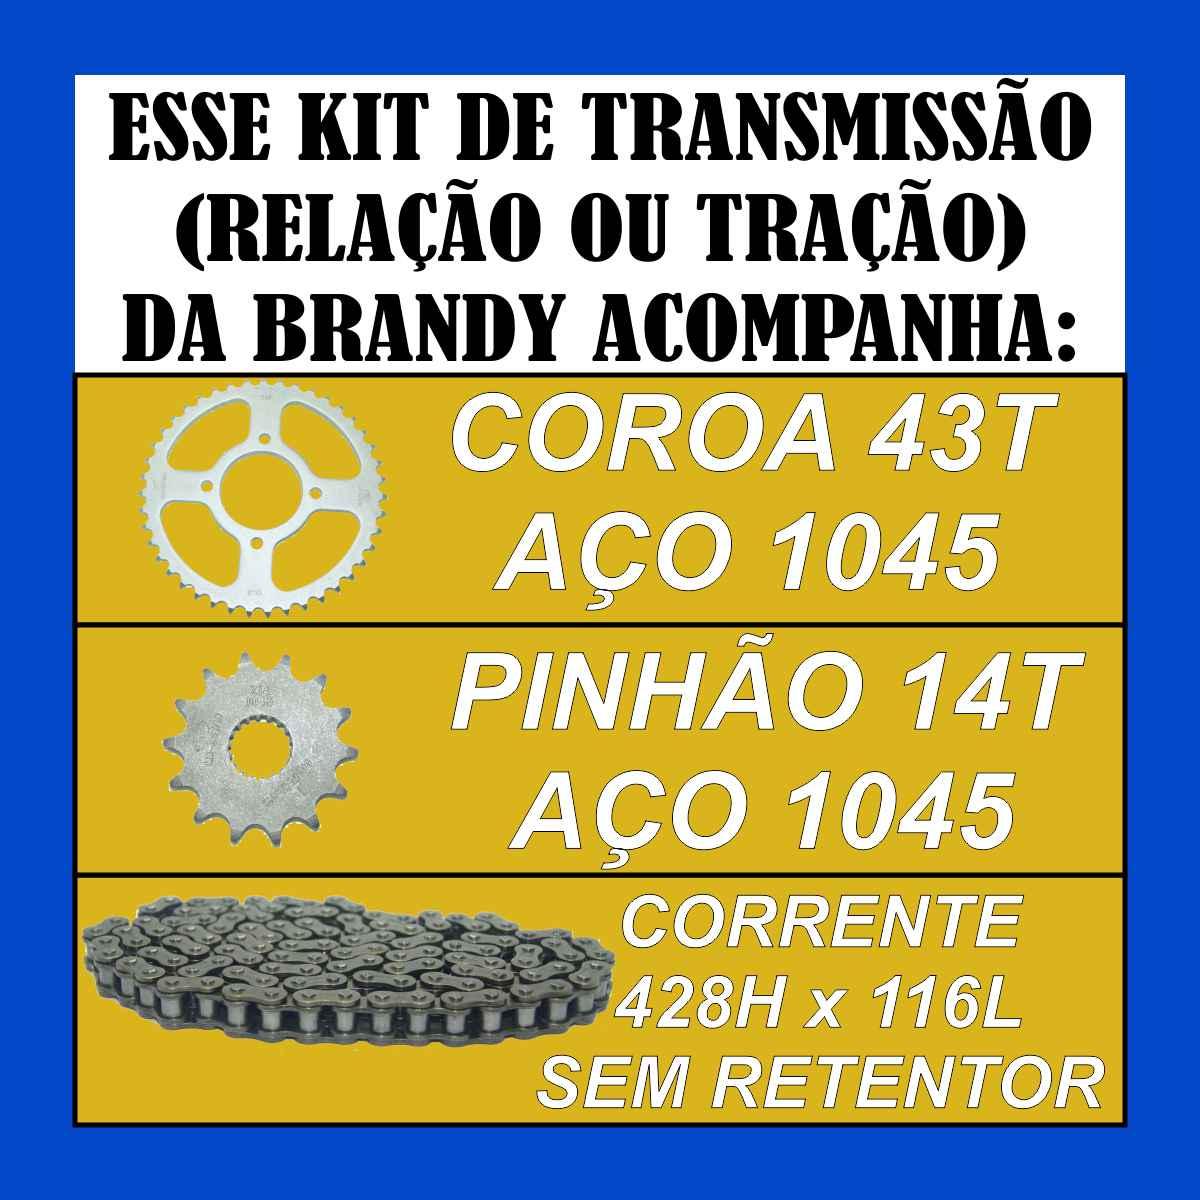 KIT TRANSMISSAO RELAÇÃO BRANDY CORRENTE 428H x 116L COROA 43T PINHÃO 14T EN 125 YES INTRUDER KATANA